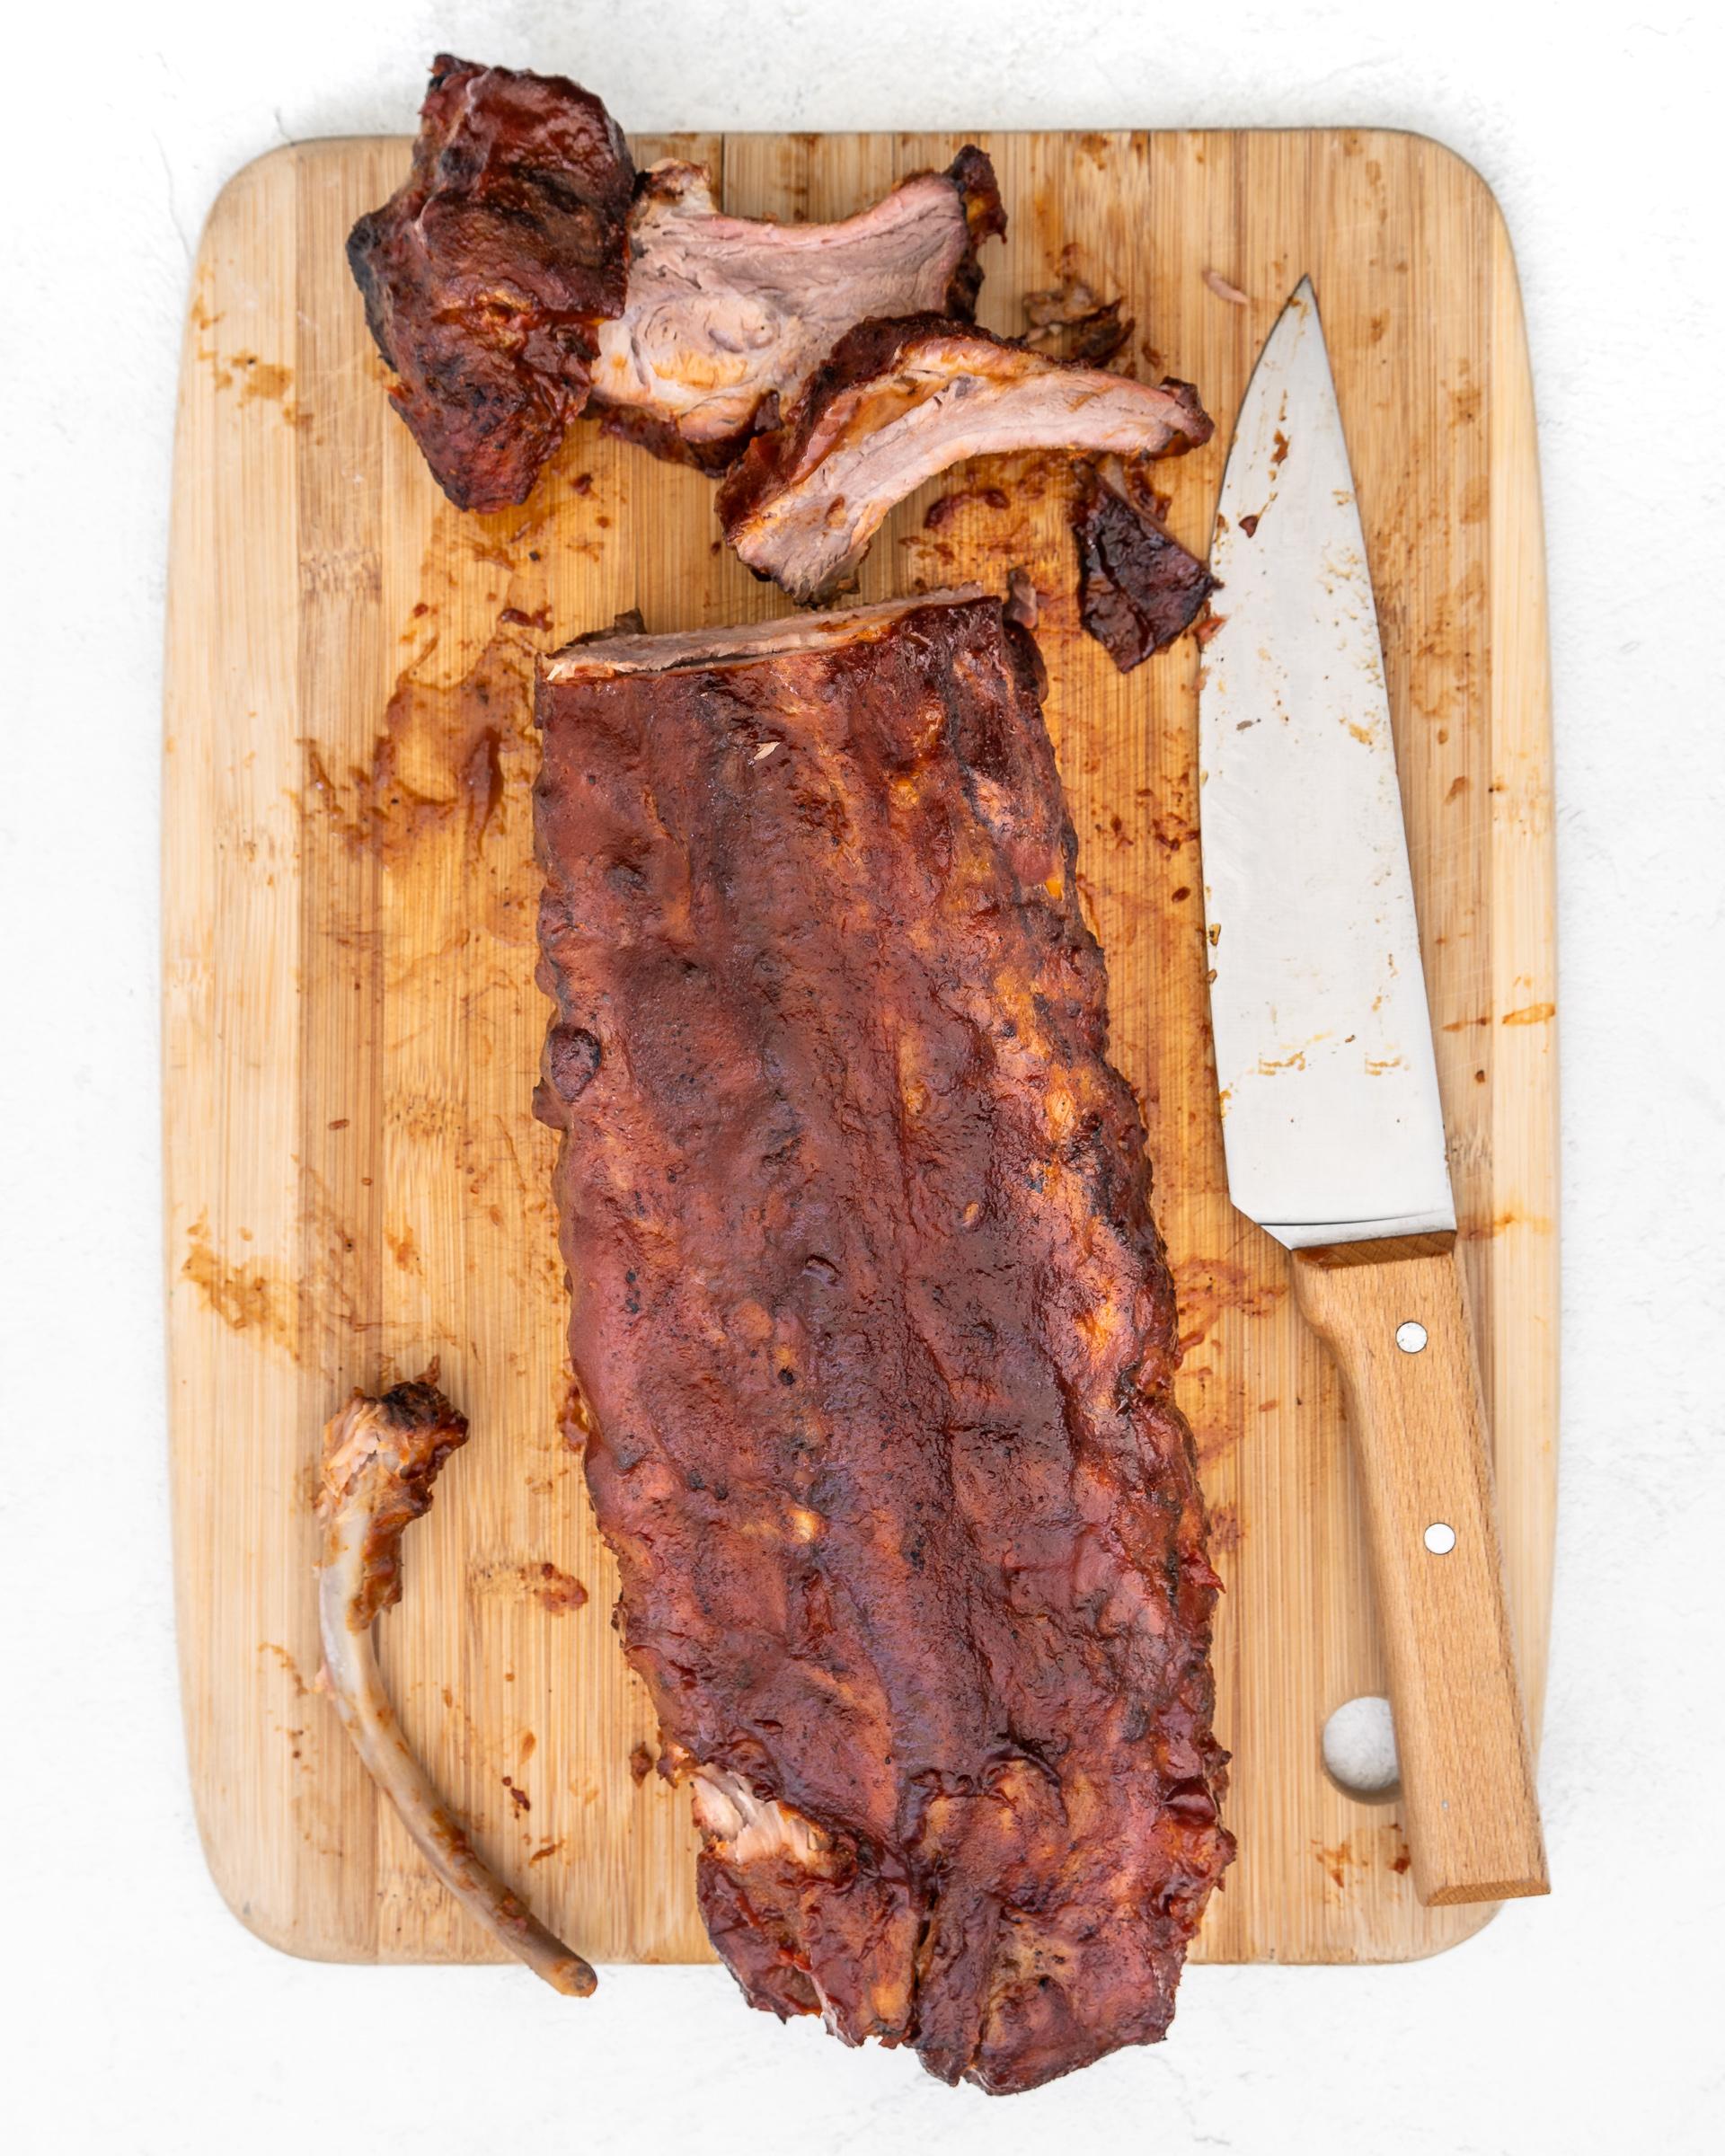 kosmos bbq sauce jeremy pawlowski portland oregon texas food photographer photography restaurant ribs